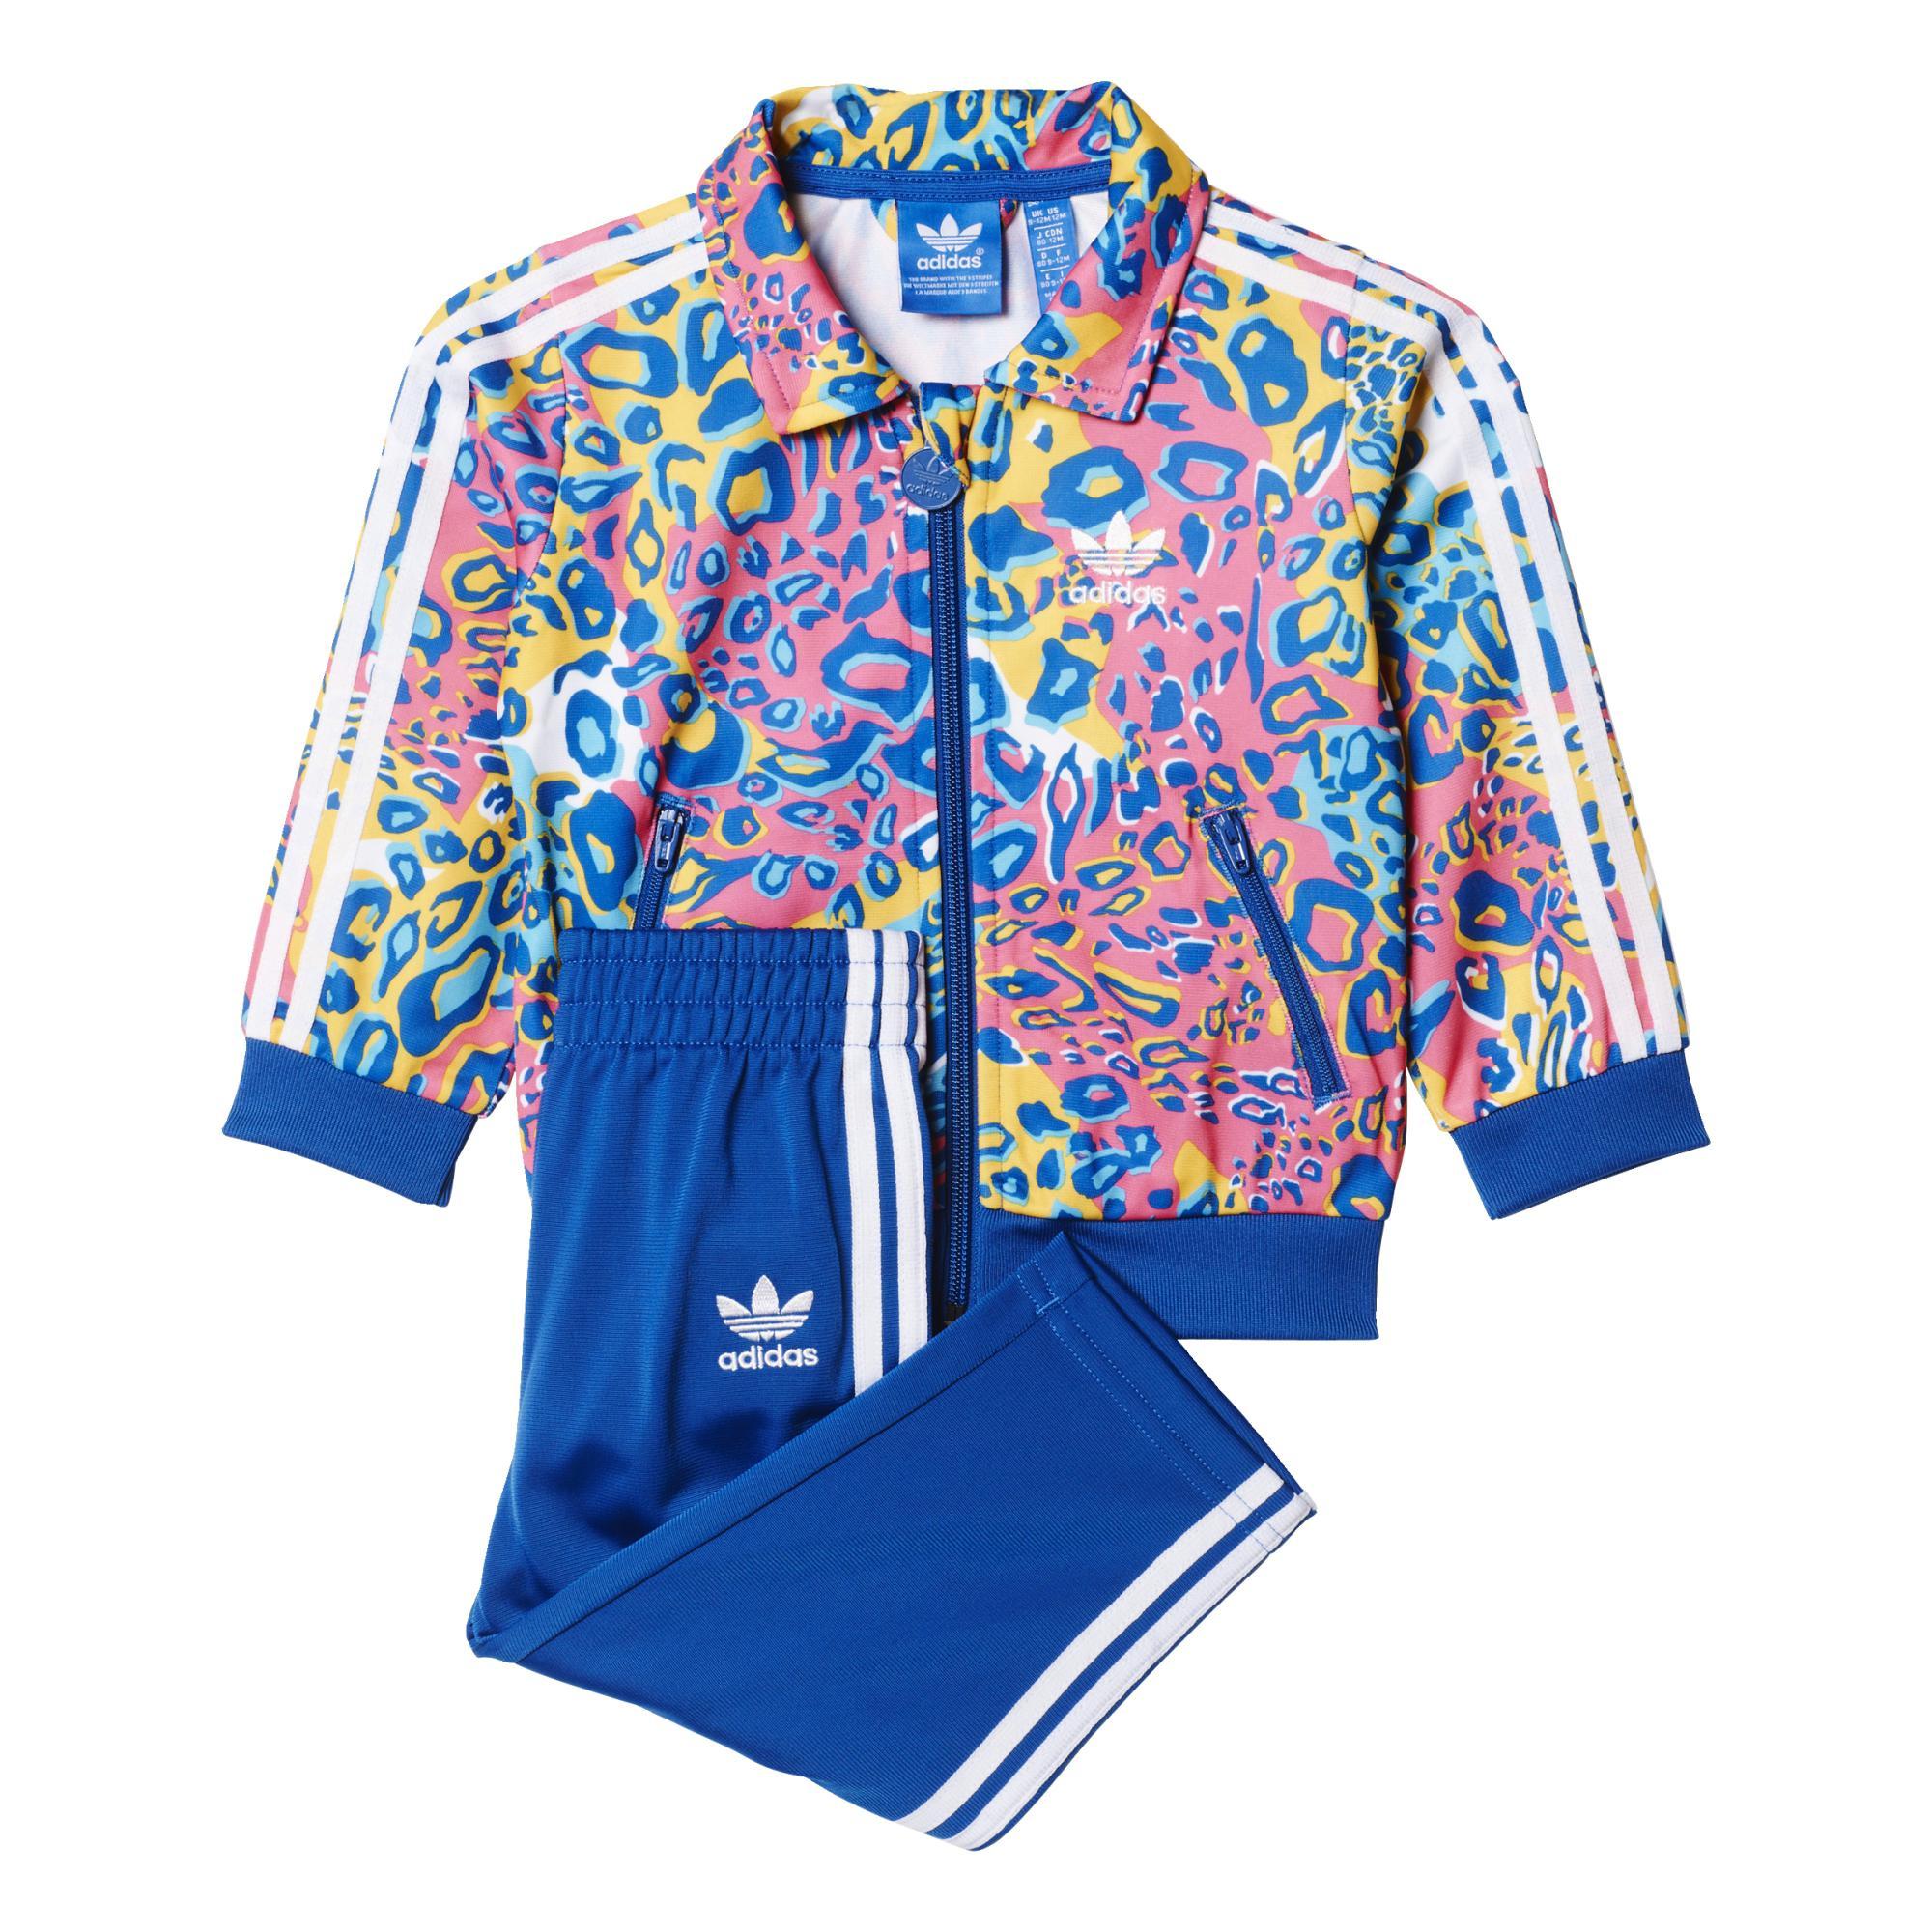 5766c5079 Adidas Originals Chándal Bebé Soccer Leopard Cub Firebird (azul/multicolor)